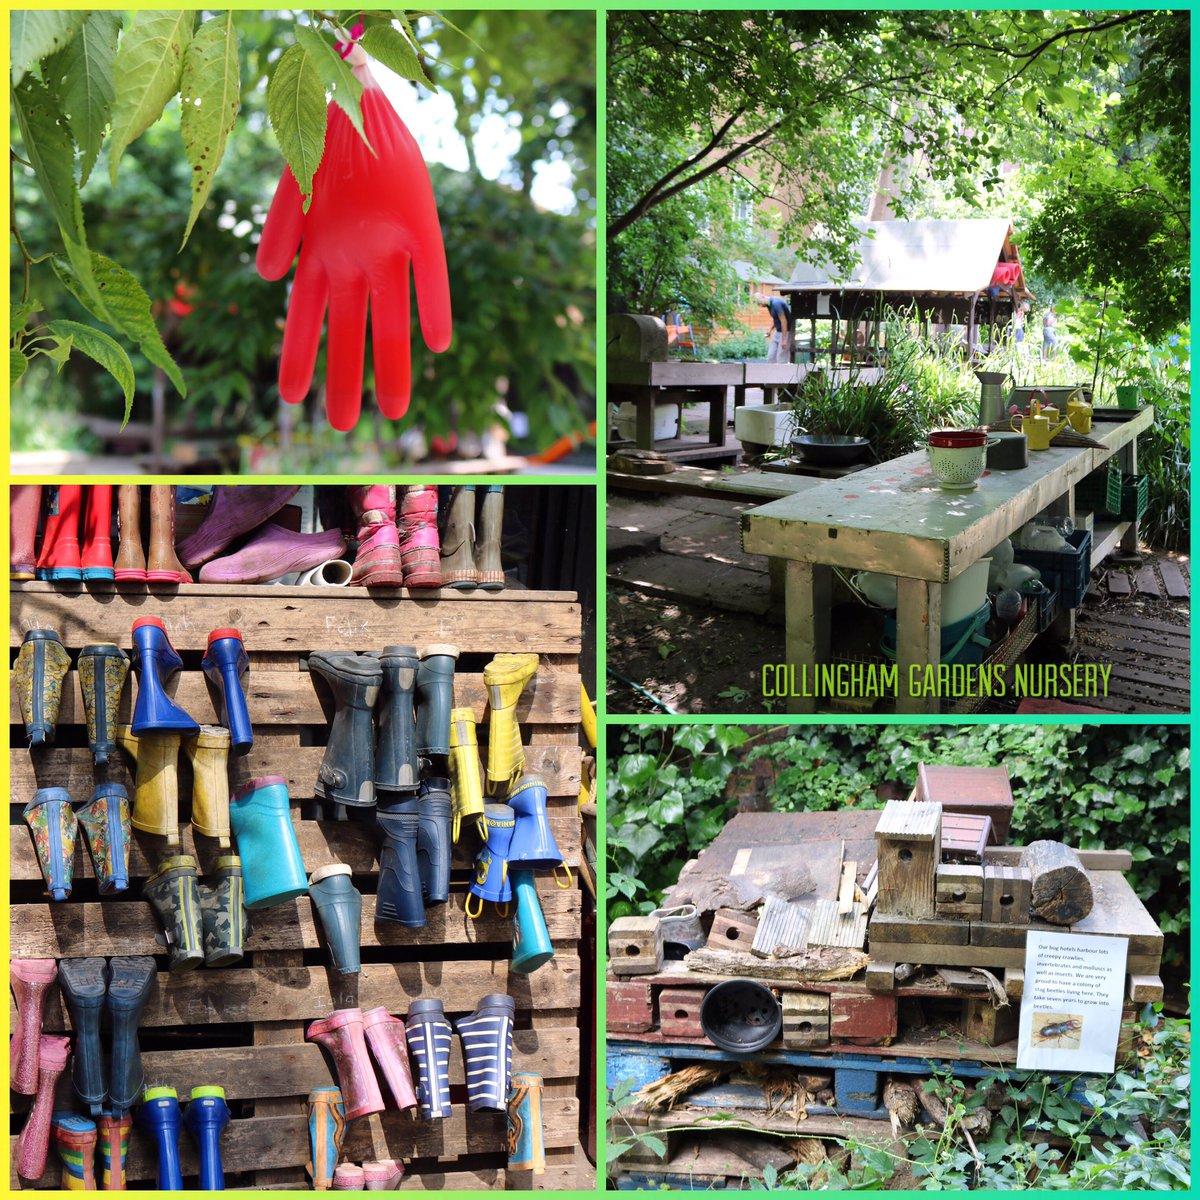 @OpenSquares 4th garden - Collingham Gardens Nursery #OGSW17  Wonderful outdoor play/learn #forestschools   @ForestSchools @ForestSchoolsUK<br>http://pic.twitter.com/oYLYHA8biO